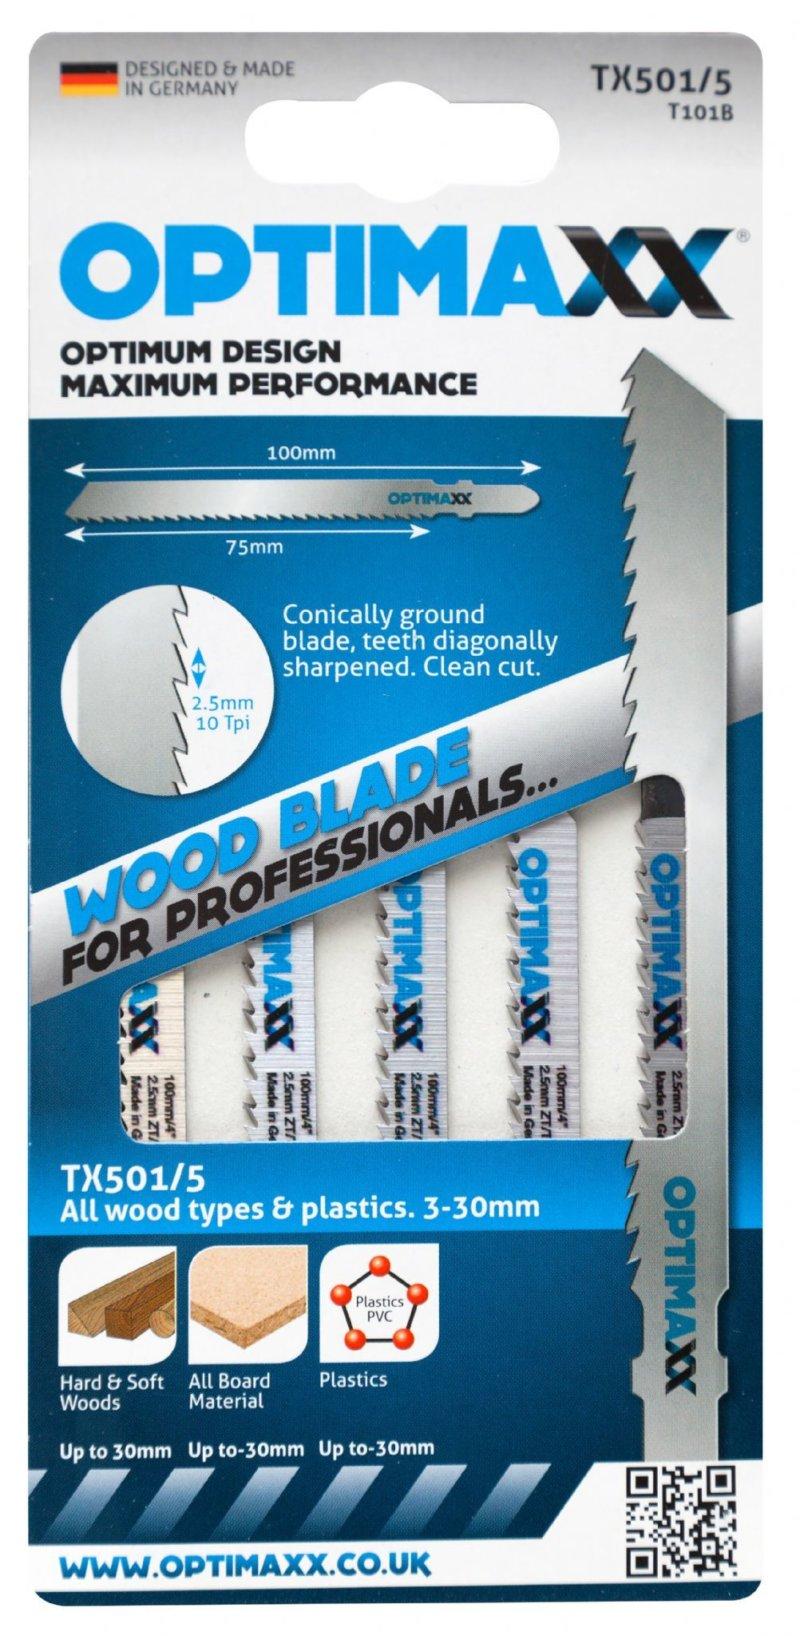 Optimaxx TX501/5 vari-use jigsaw blades wood/plastic - Pack of 5